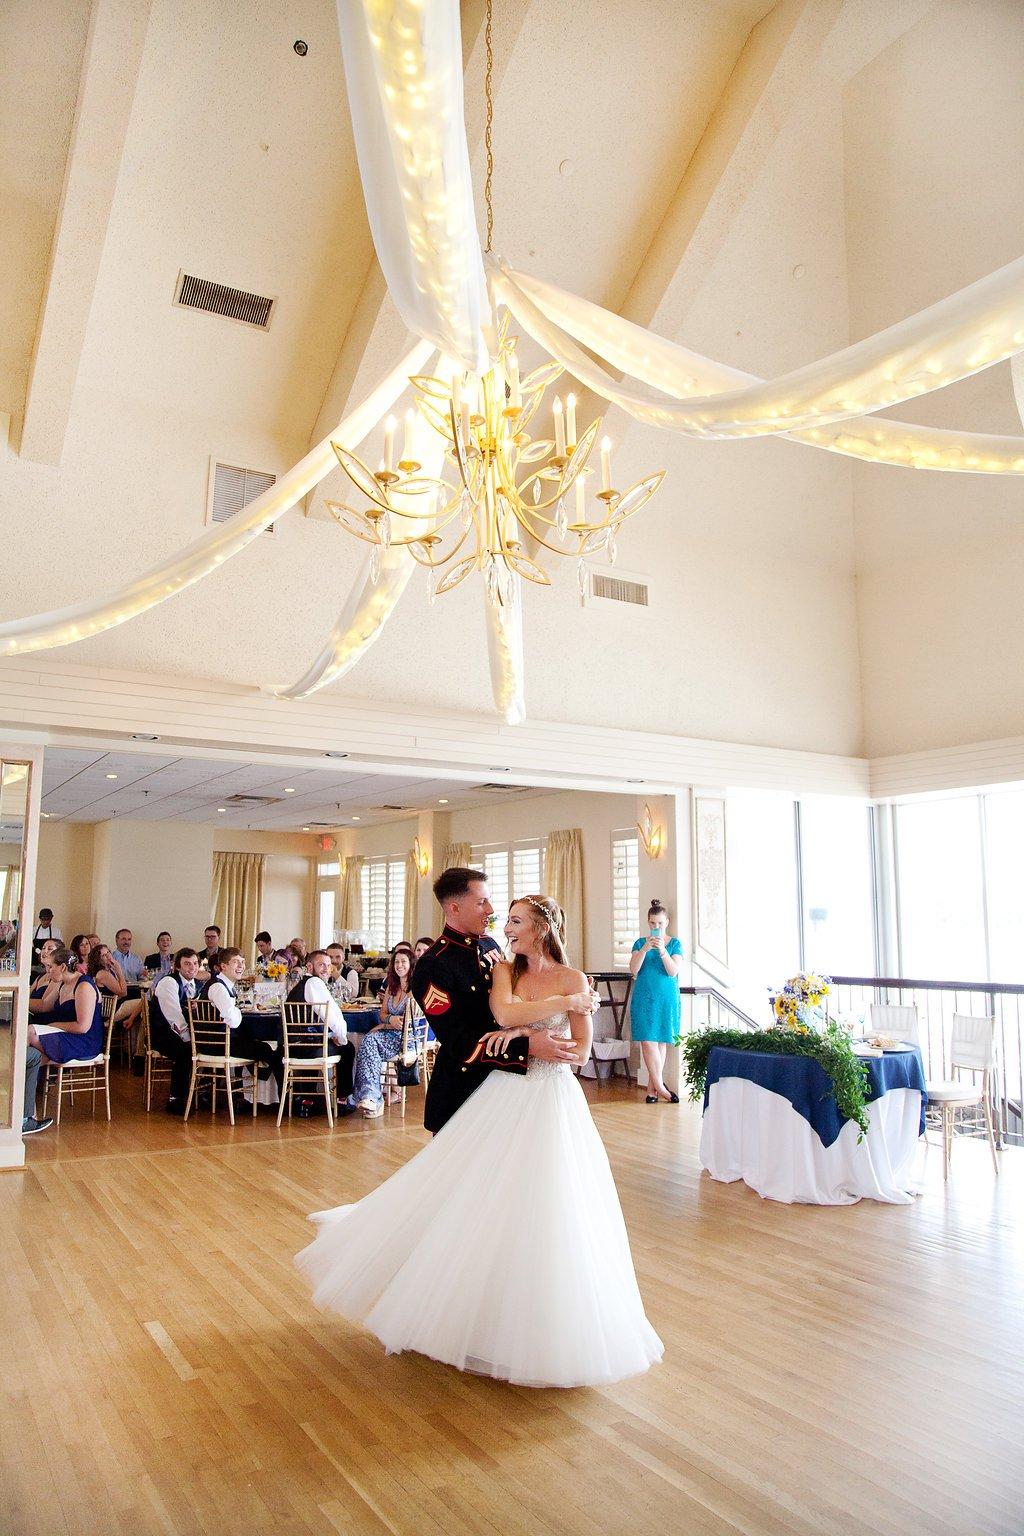 Best-First-Dance-Ballroom-Lesner-Inn-Virginia-Beach-Reception-Kelly-Marie-Photography